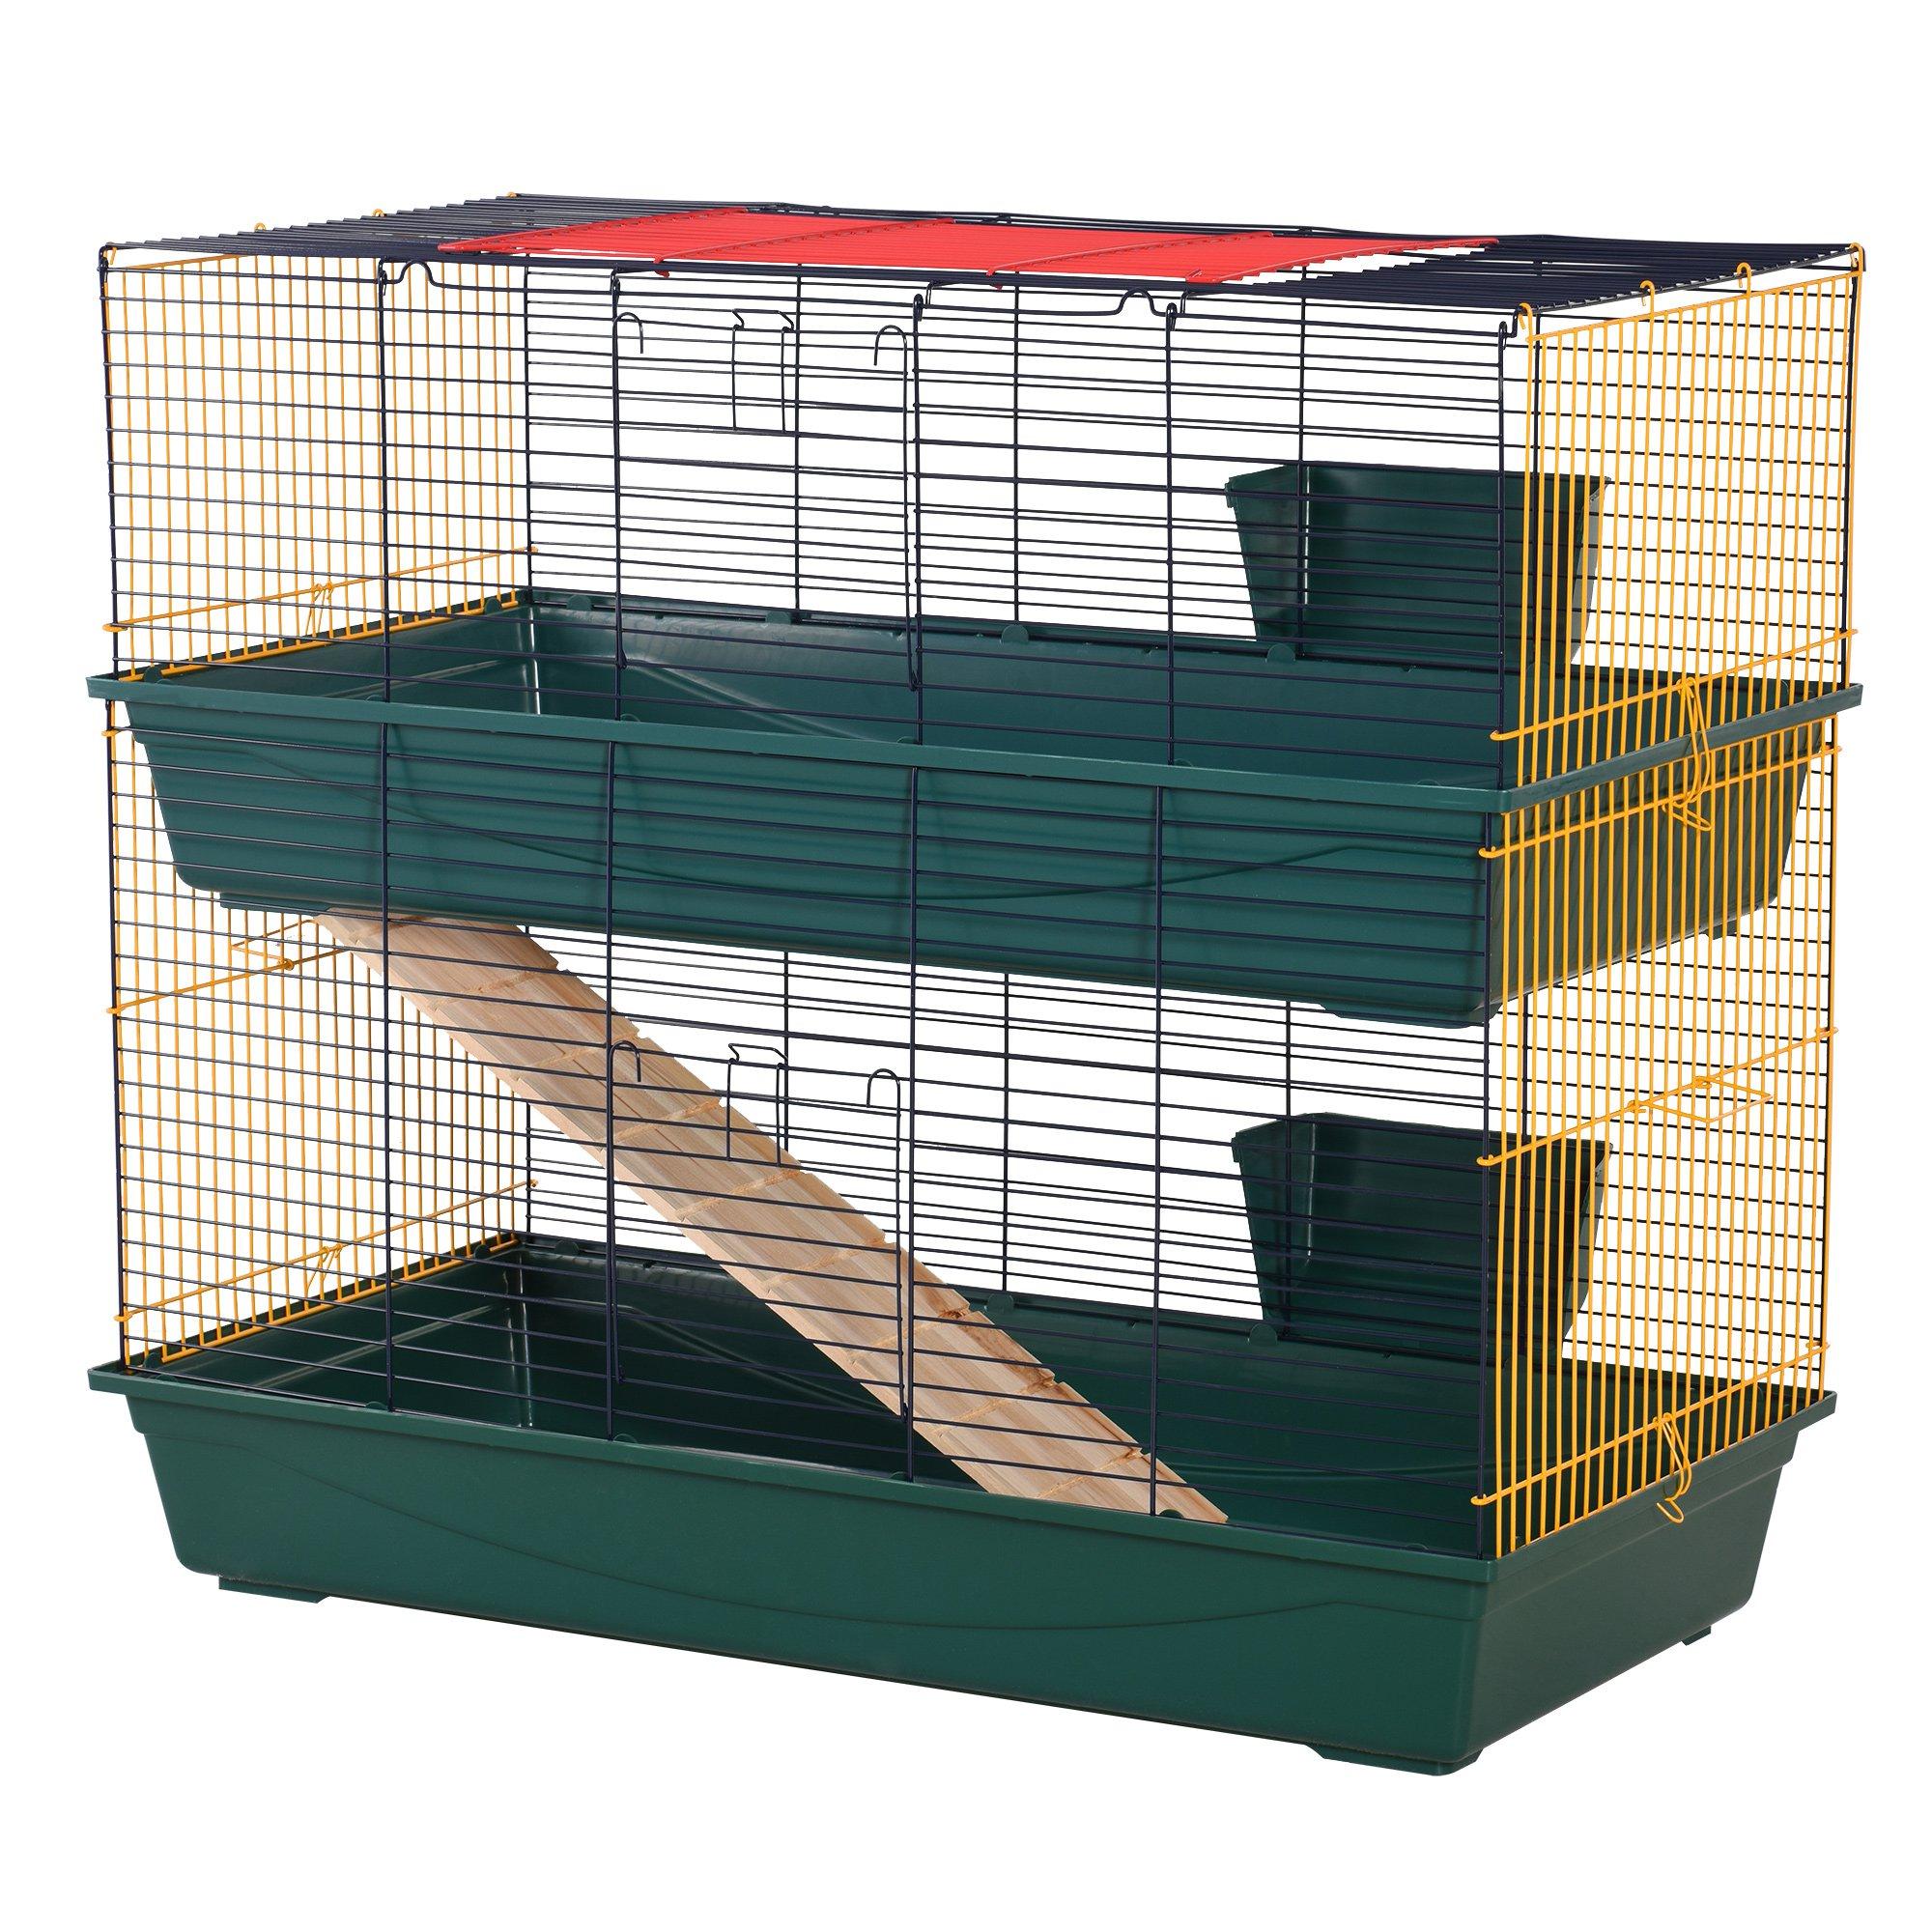 PawHut Cusca pentru iepuri cu 2 Niveluri cu Rampa, 3 Usi si 2 Alimentatoare imagine aosom.ro